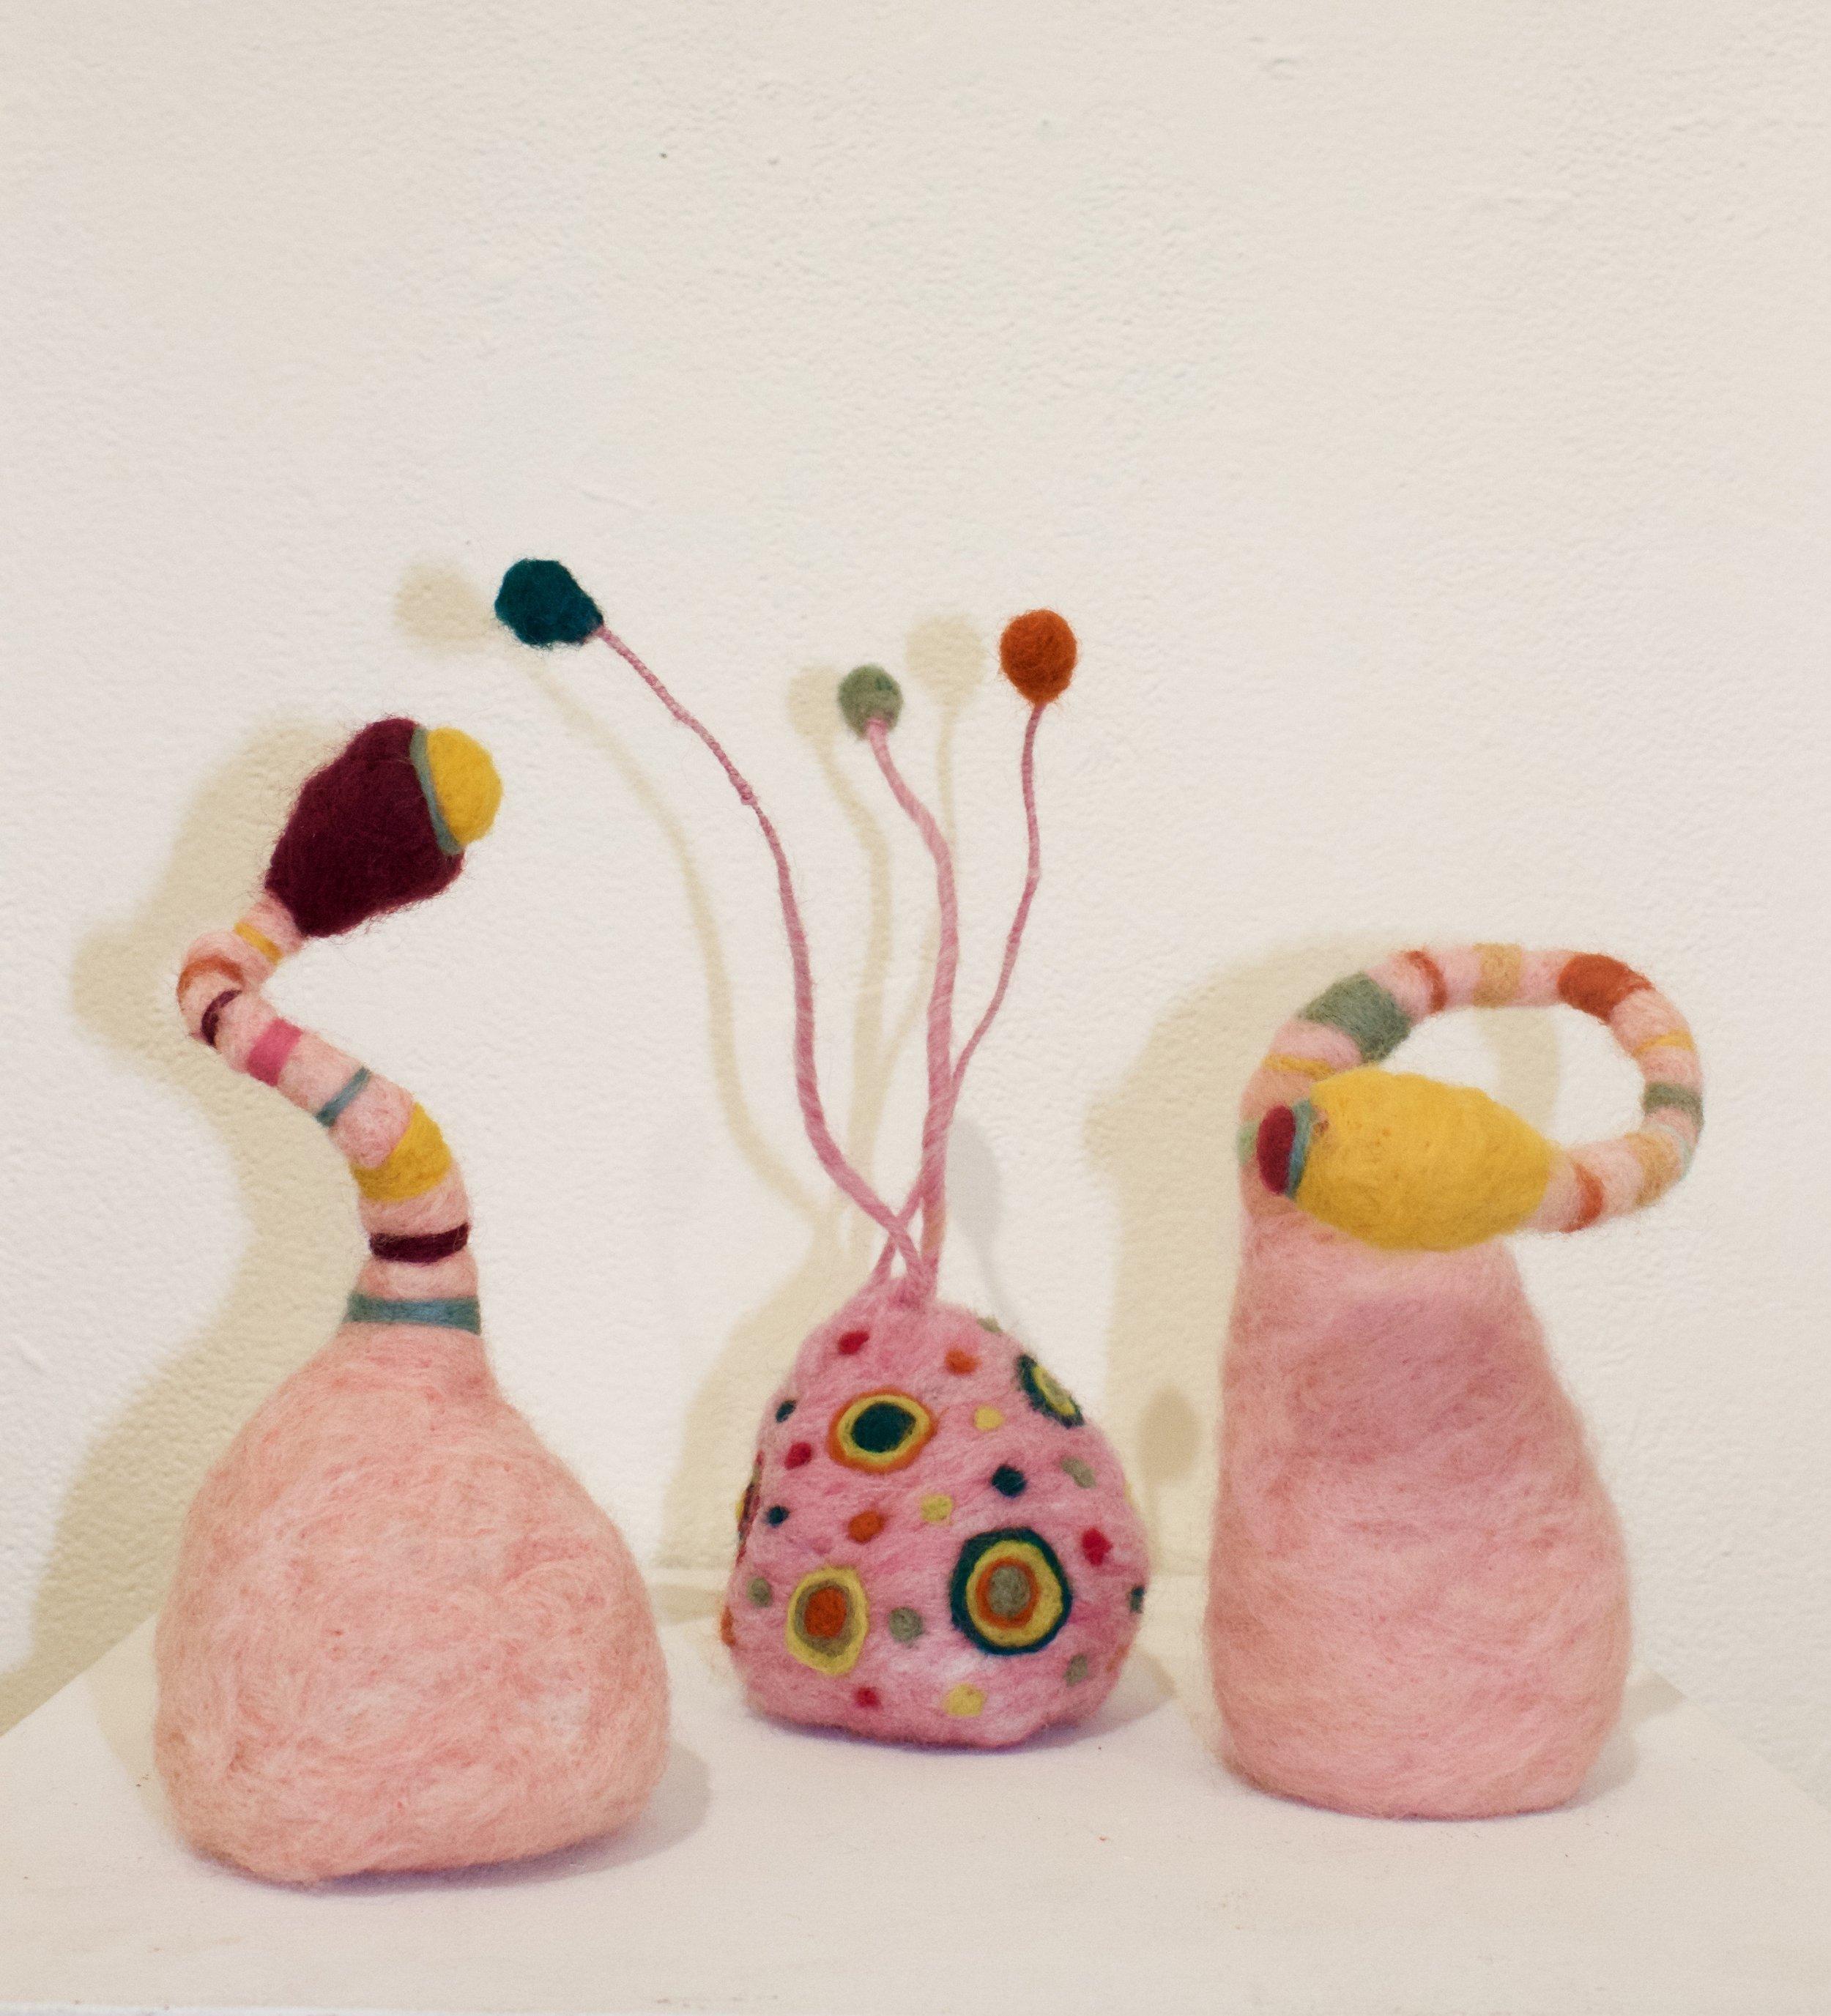 3 Pink Plants, Joyous  Wool roving, wire, polyfil